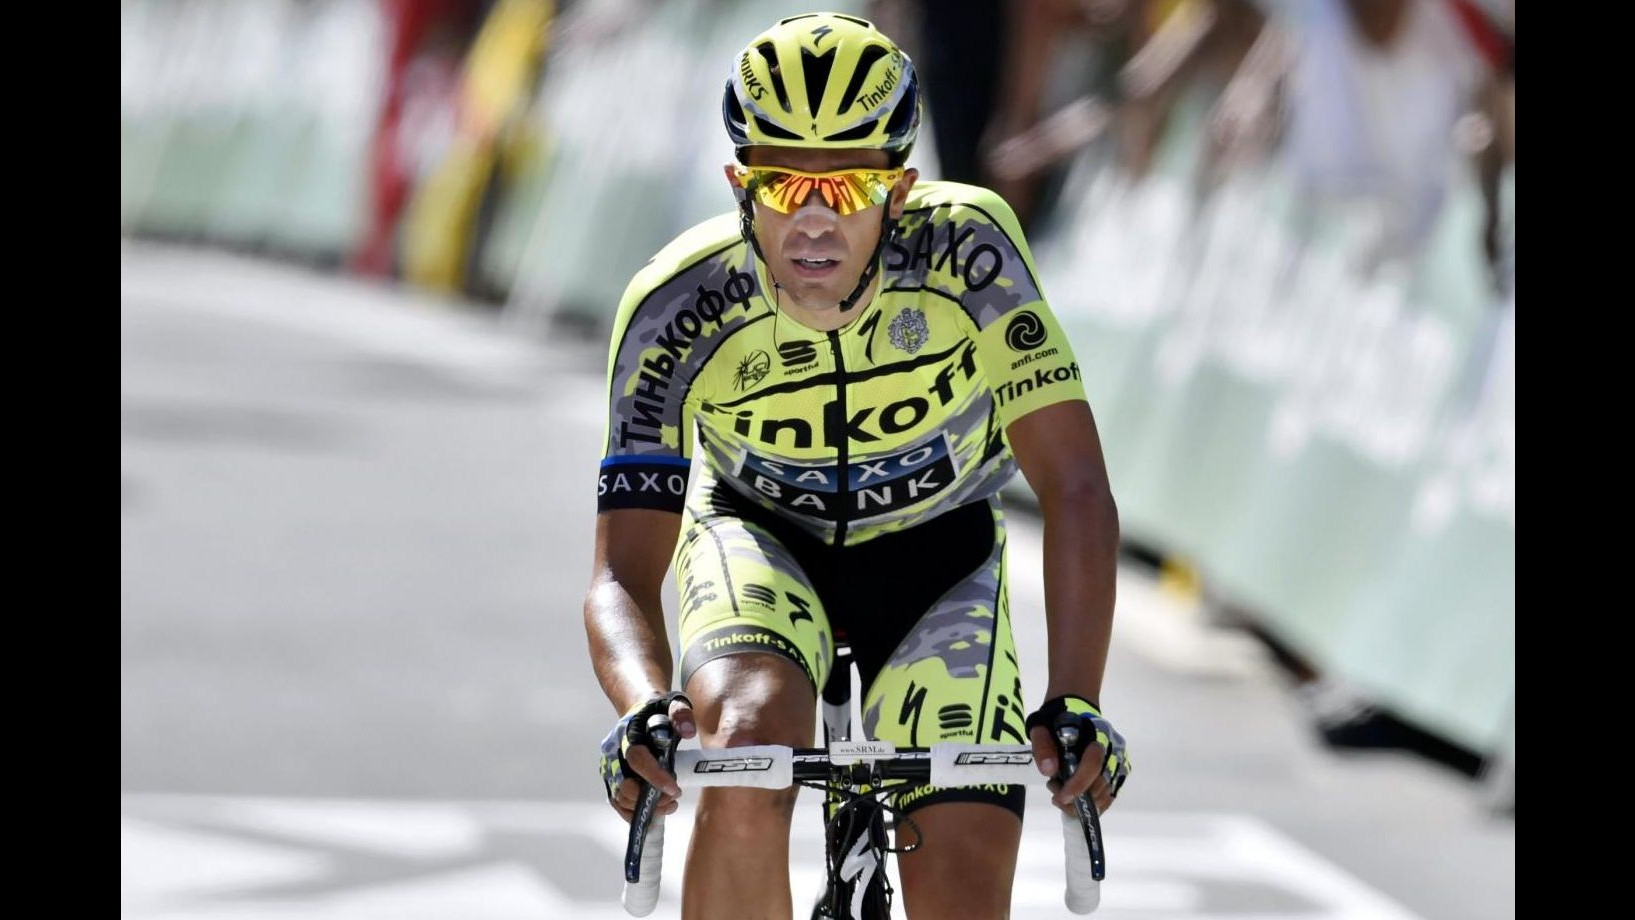 Tour de France, Contador: Non mi arrendo, voglio vincere